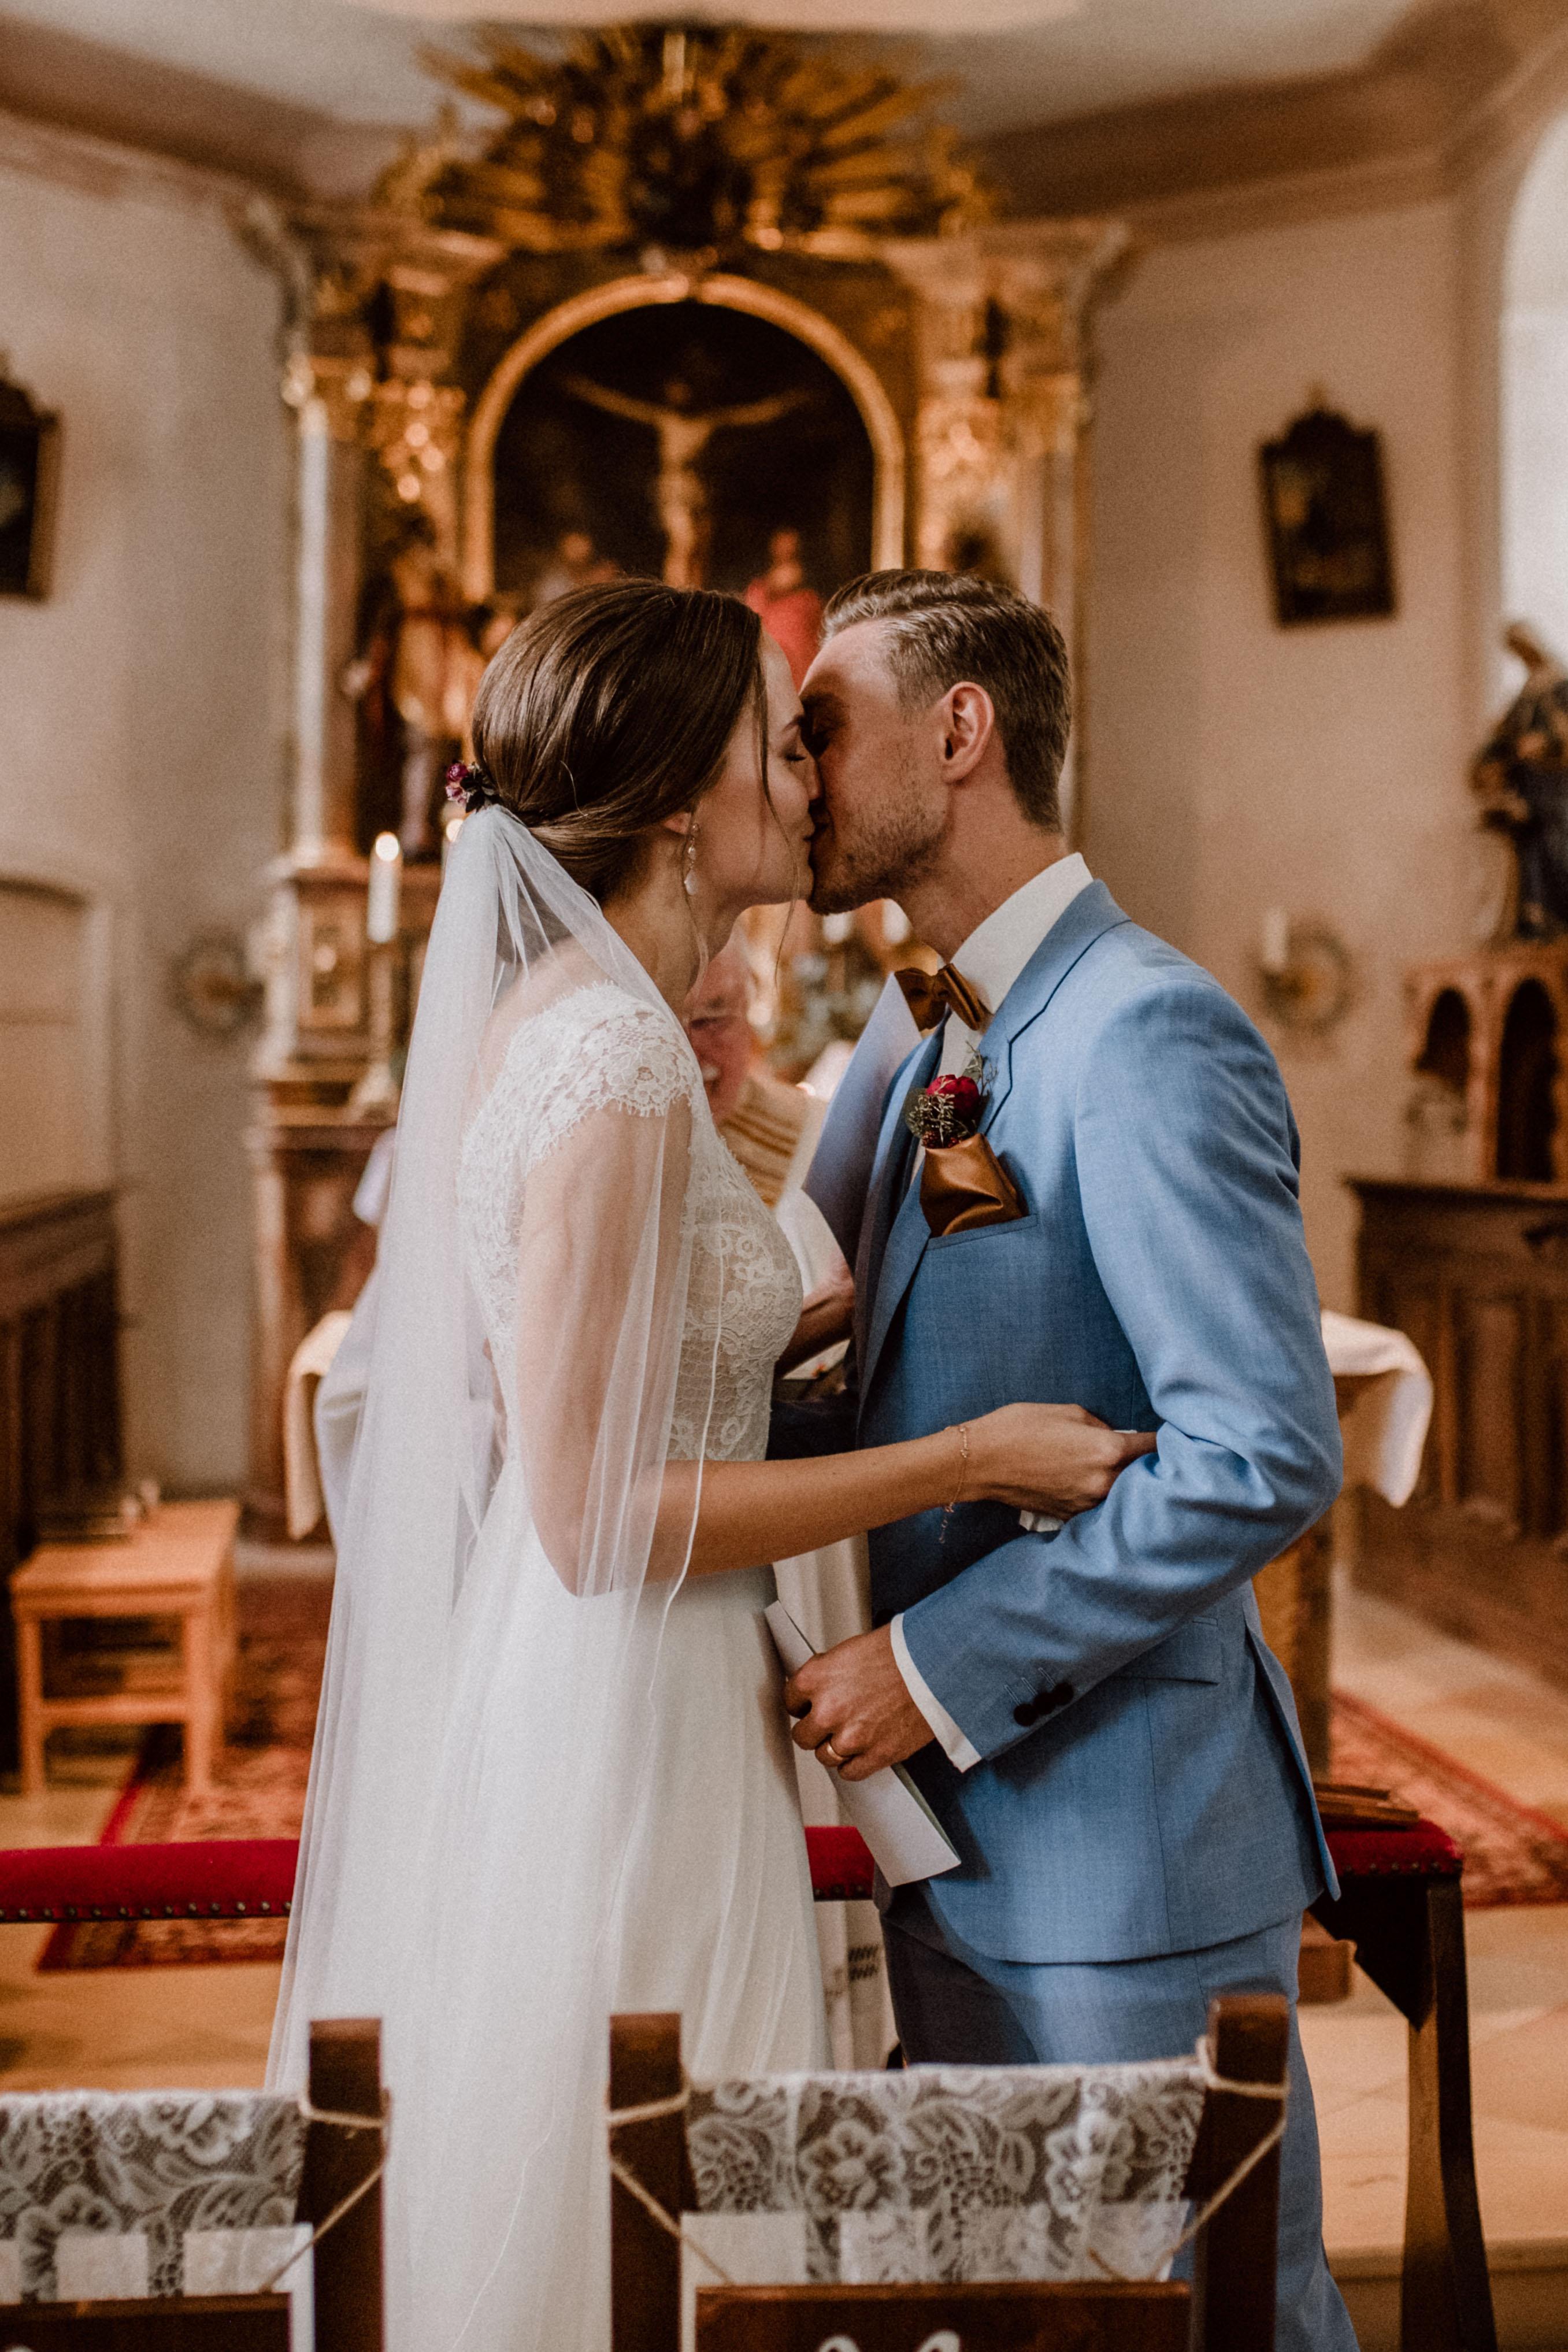 kiss love sonja poehlmann photography couples muenchen bayern